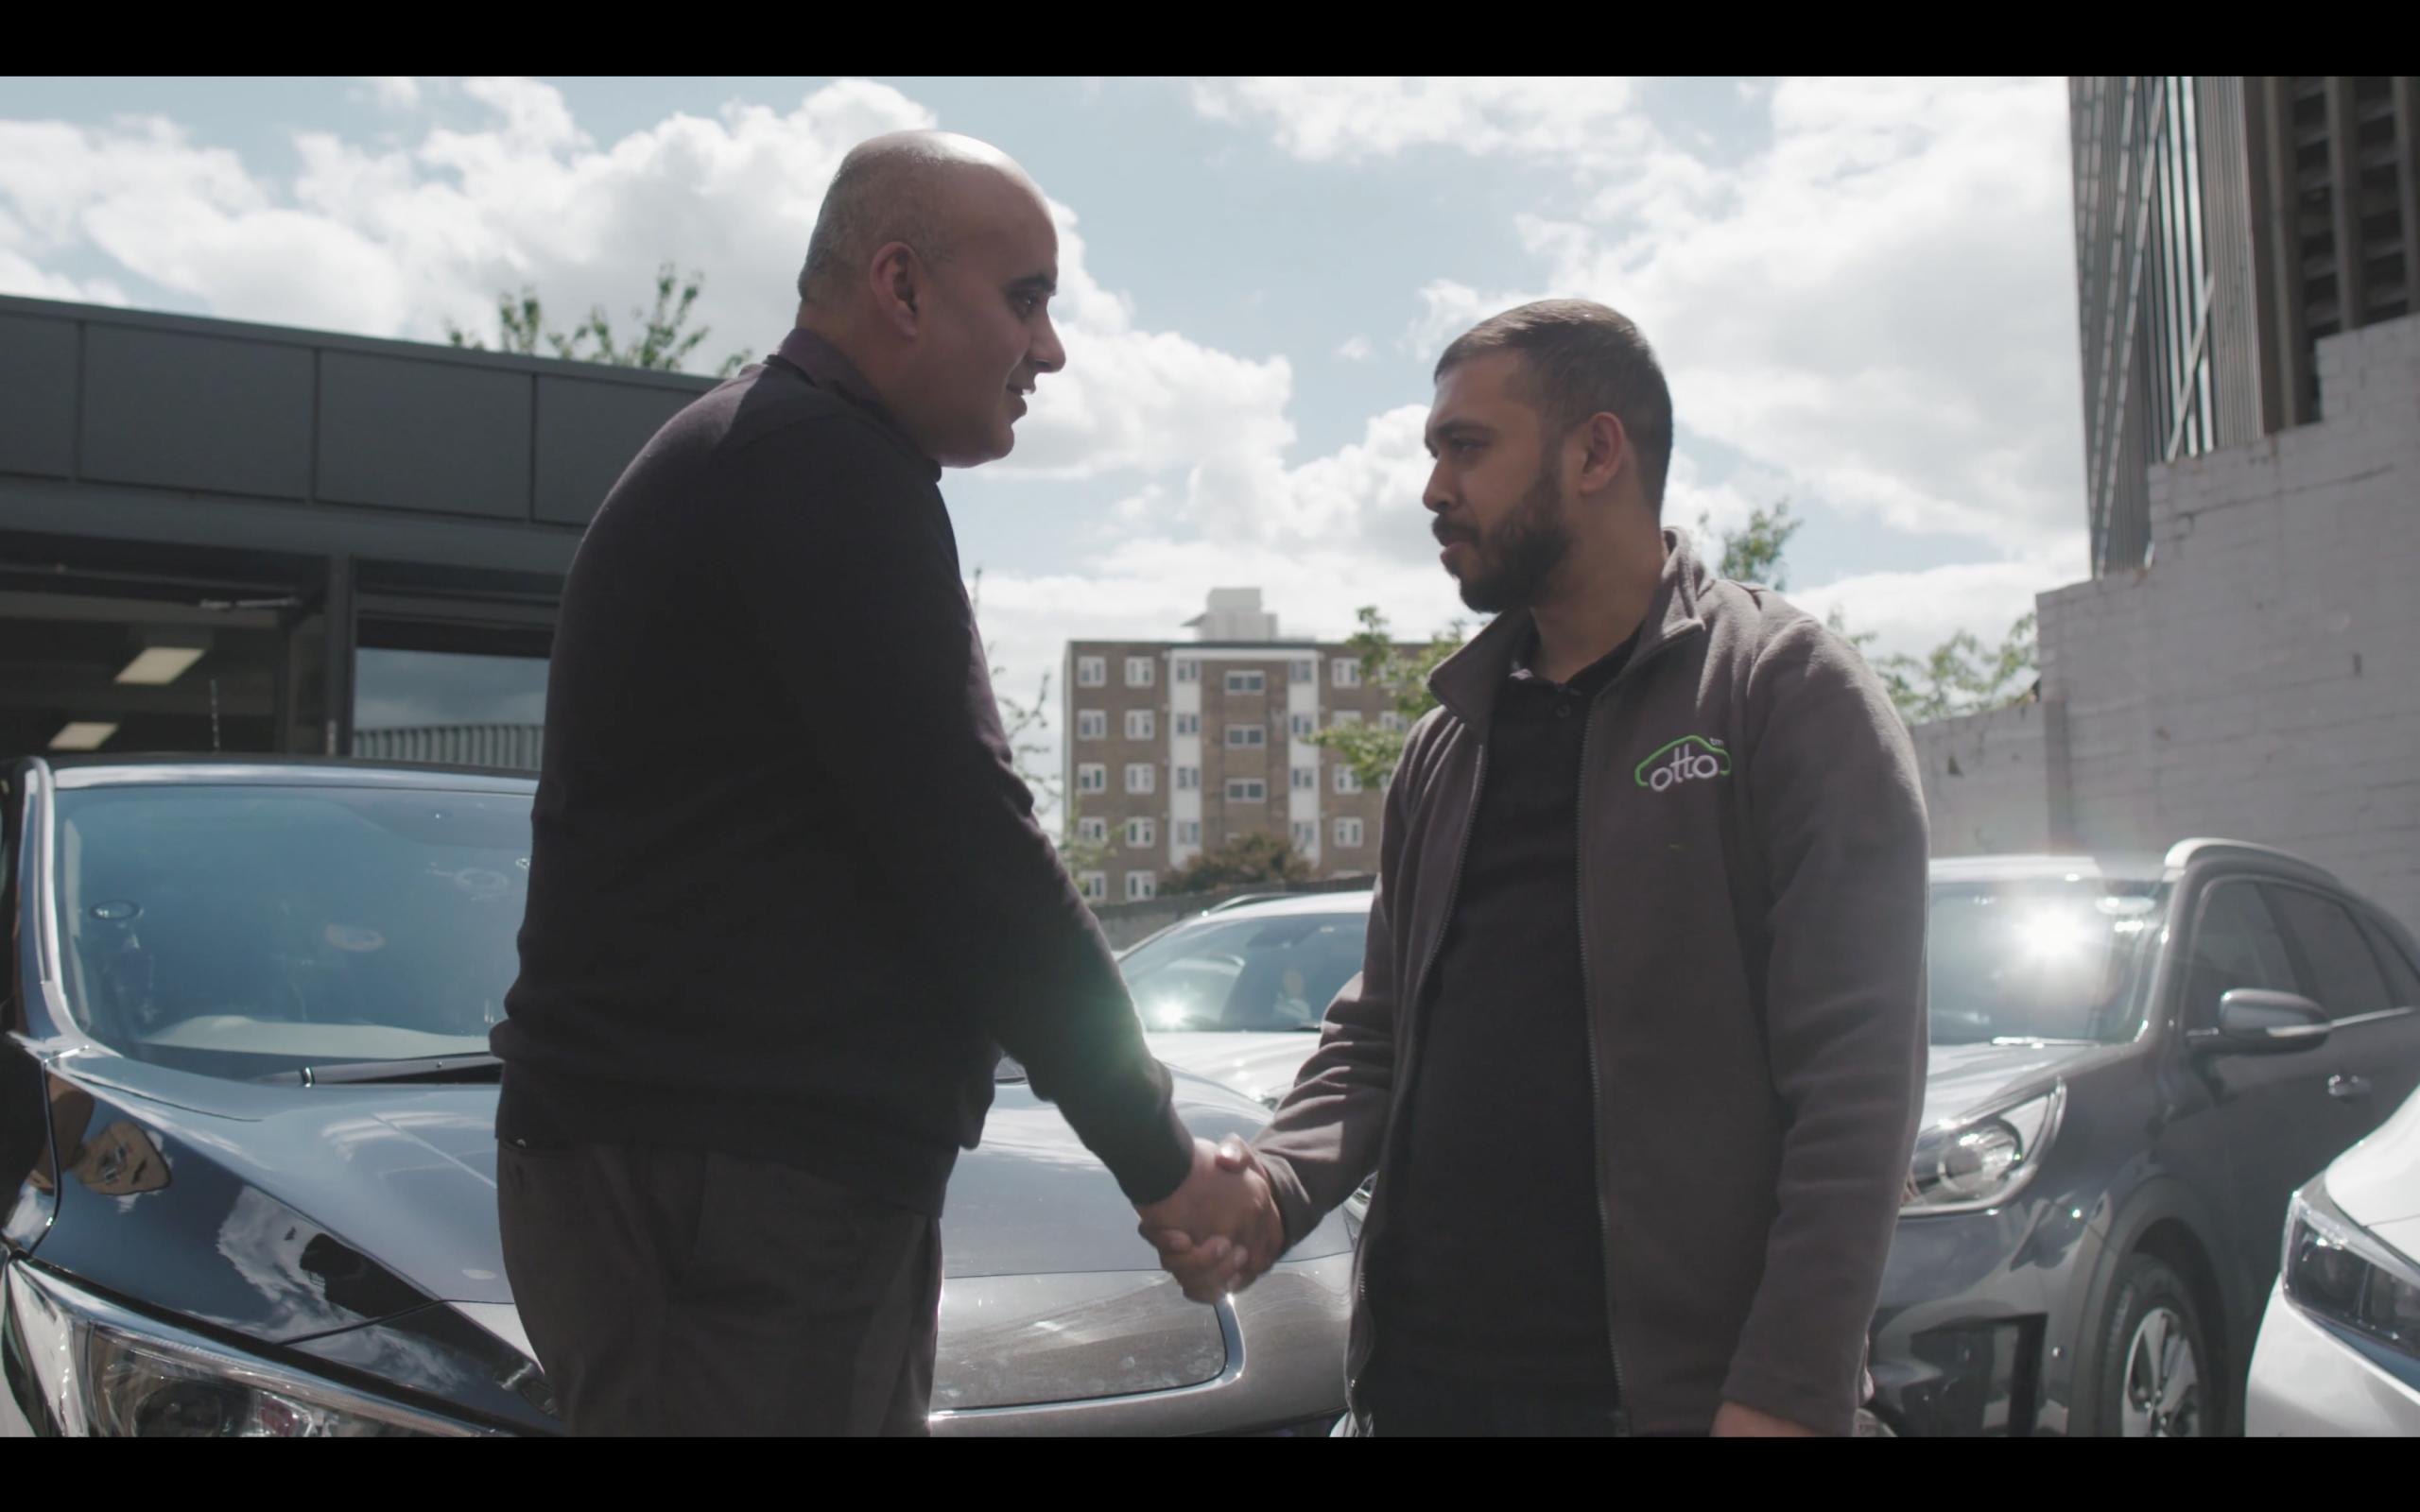 Uber Vehicles- people shaking hands